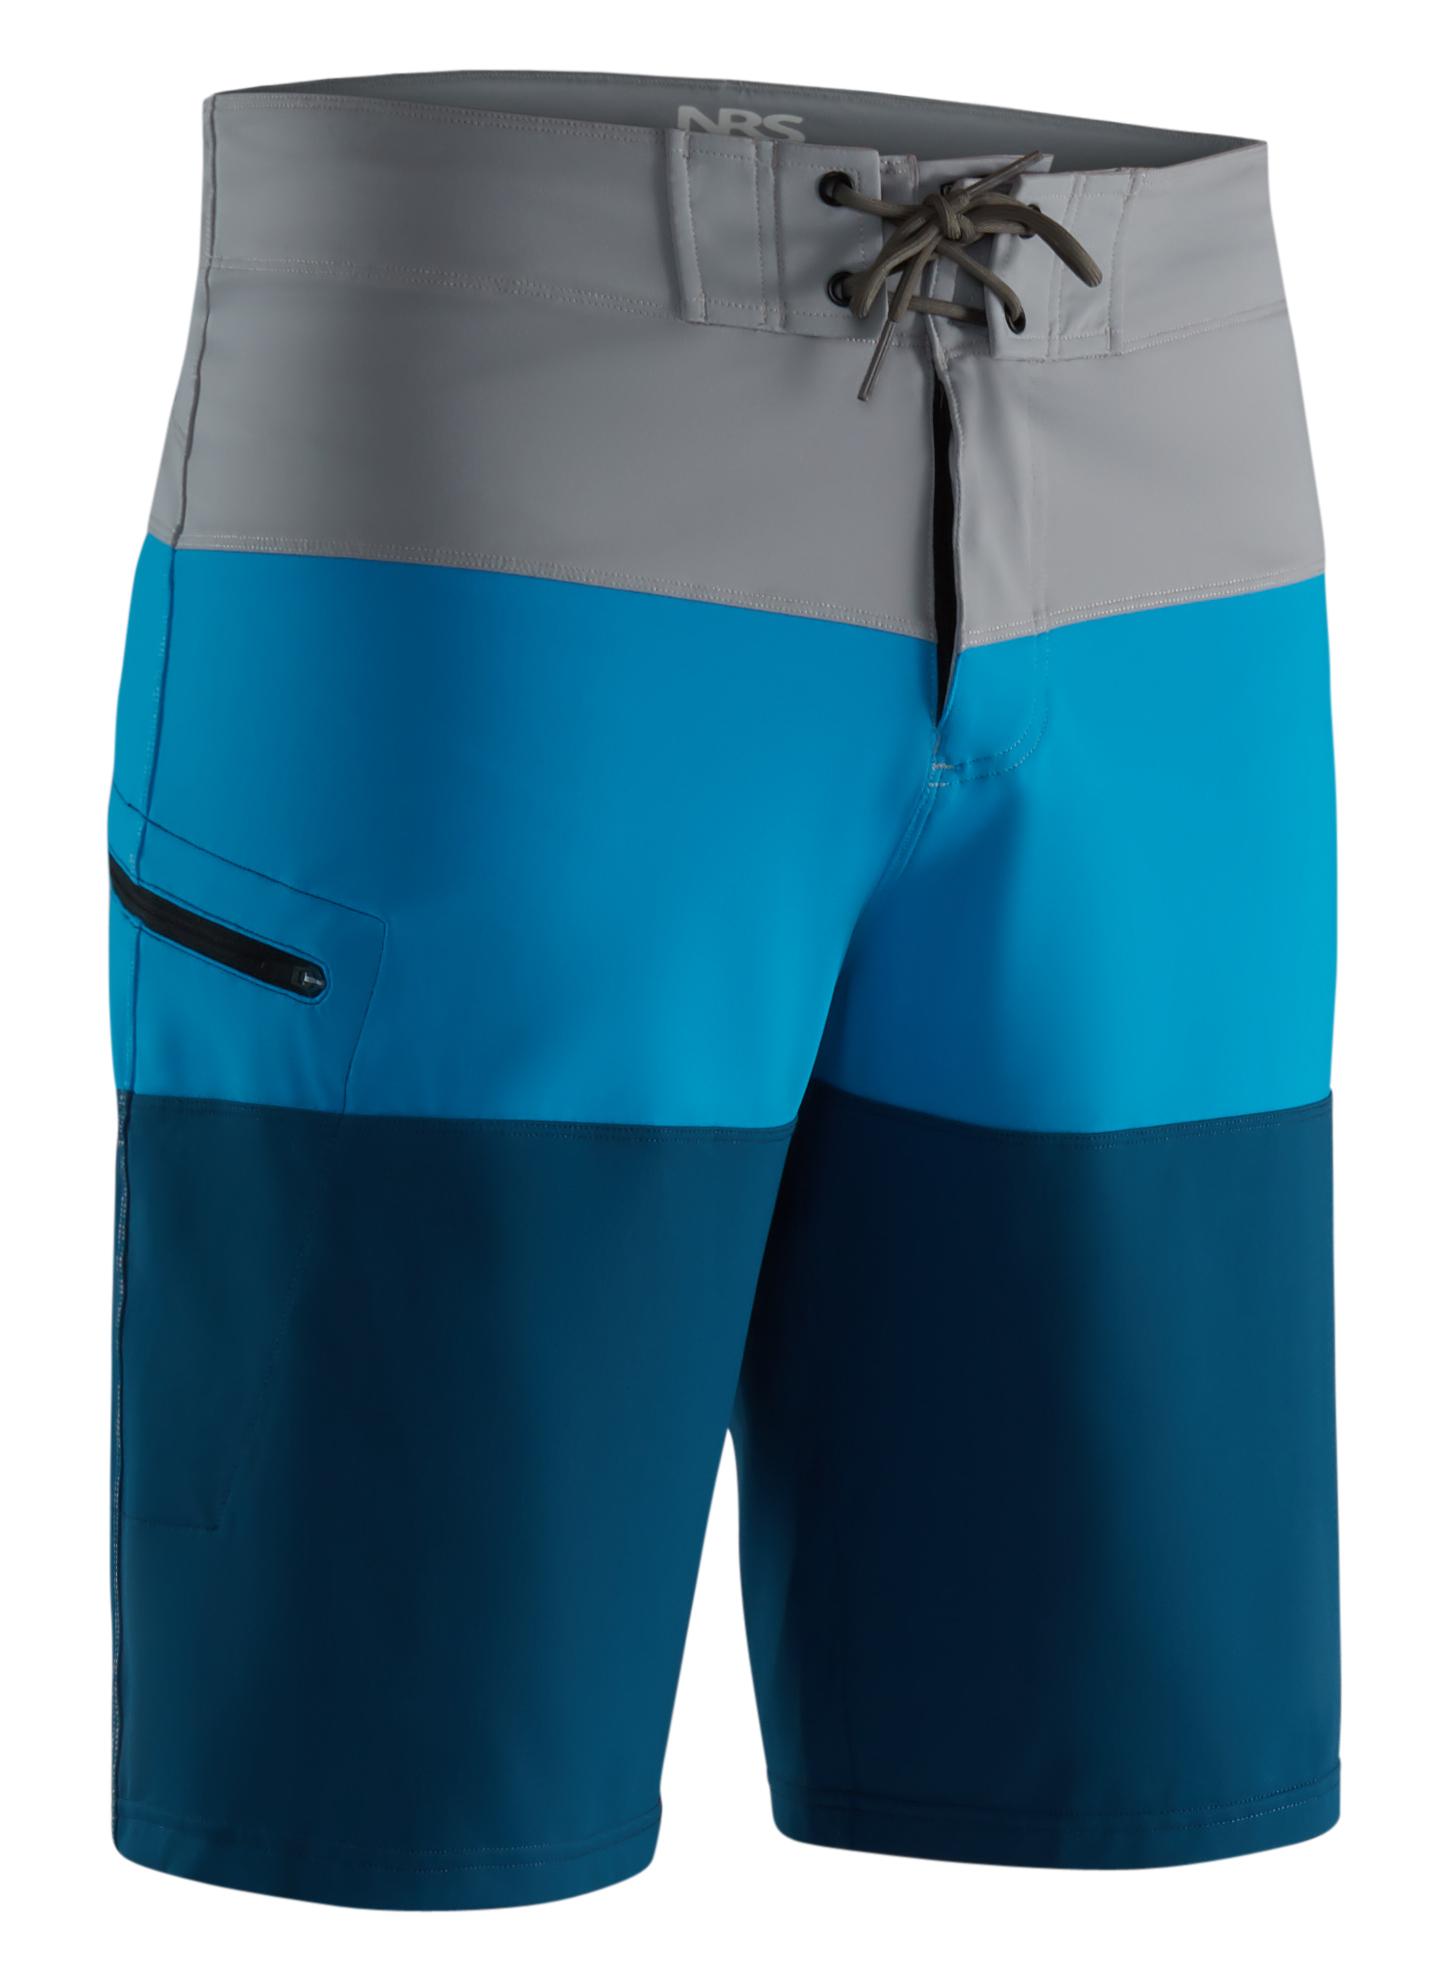 2018 NRS Men's Benny Board Shorts